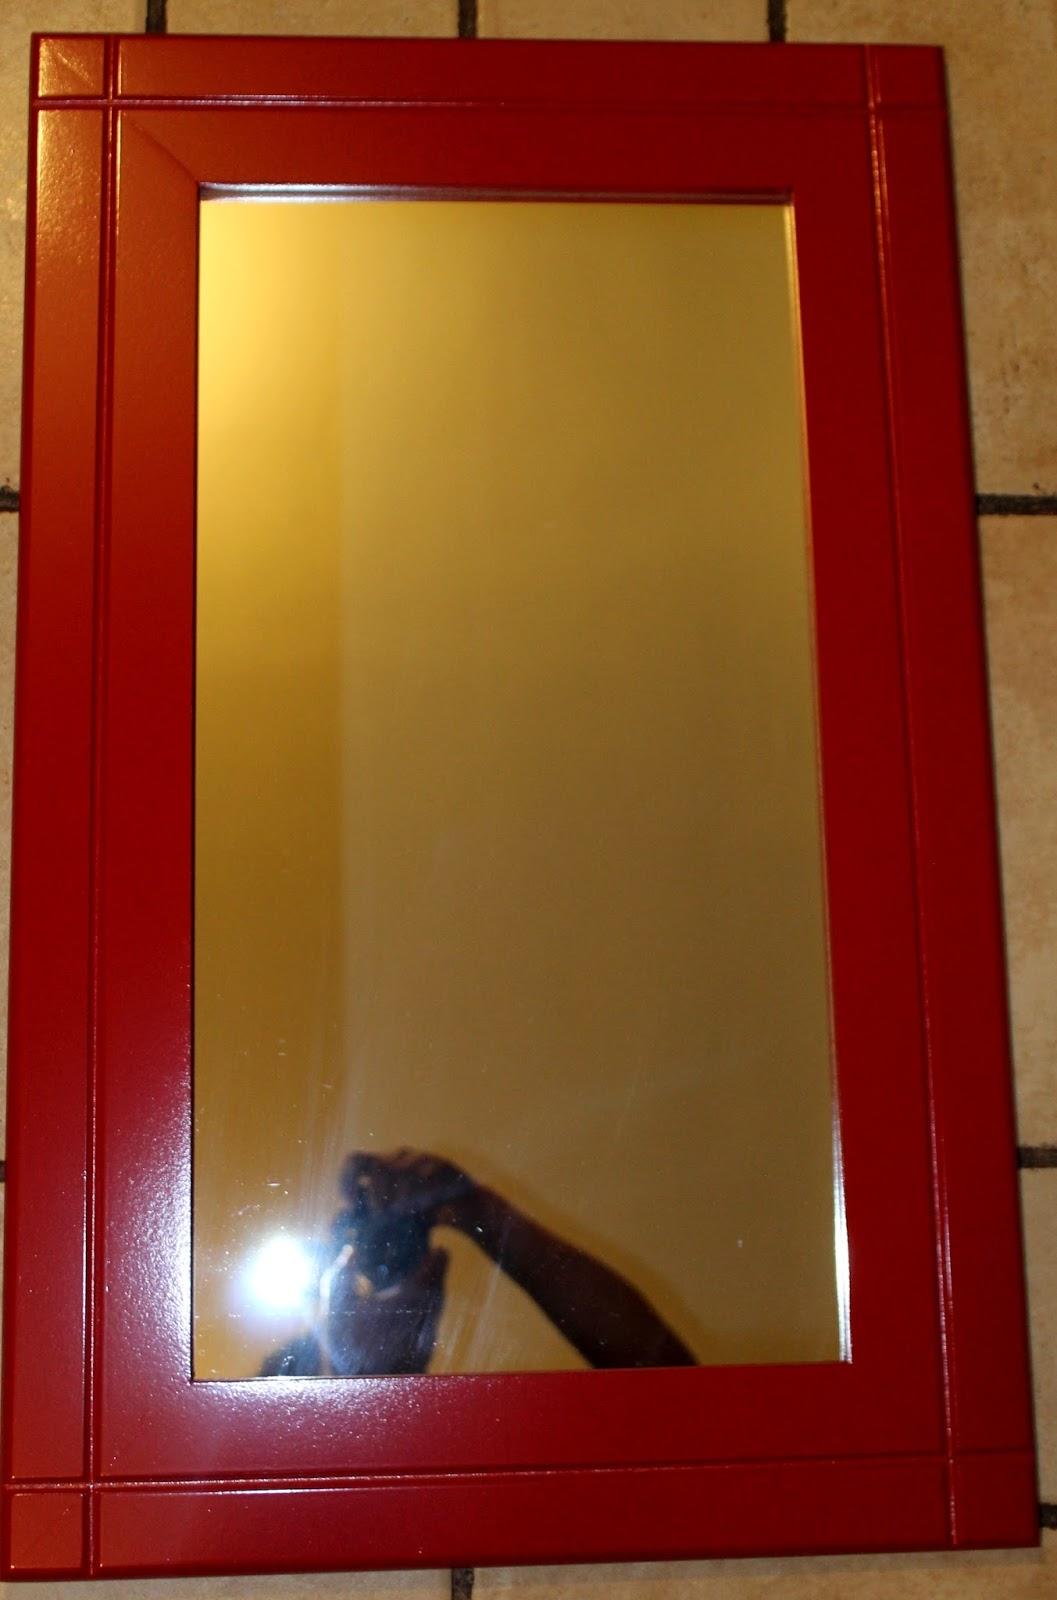 Manualidades en mdf espejo marco horizontal nombre en 3 for Espejo horizontal